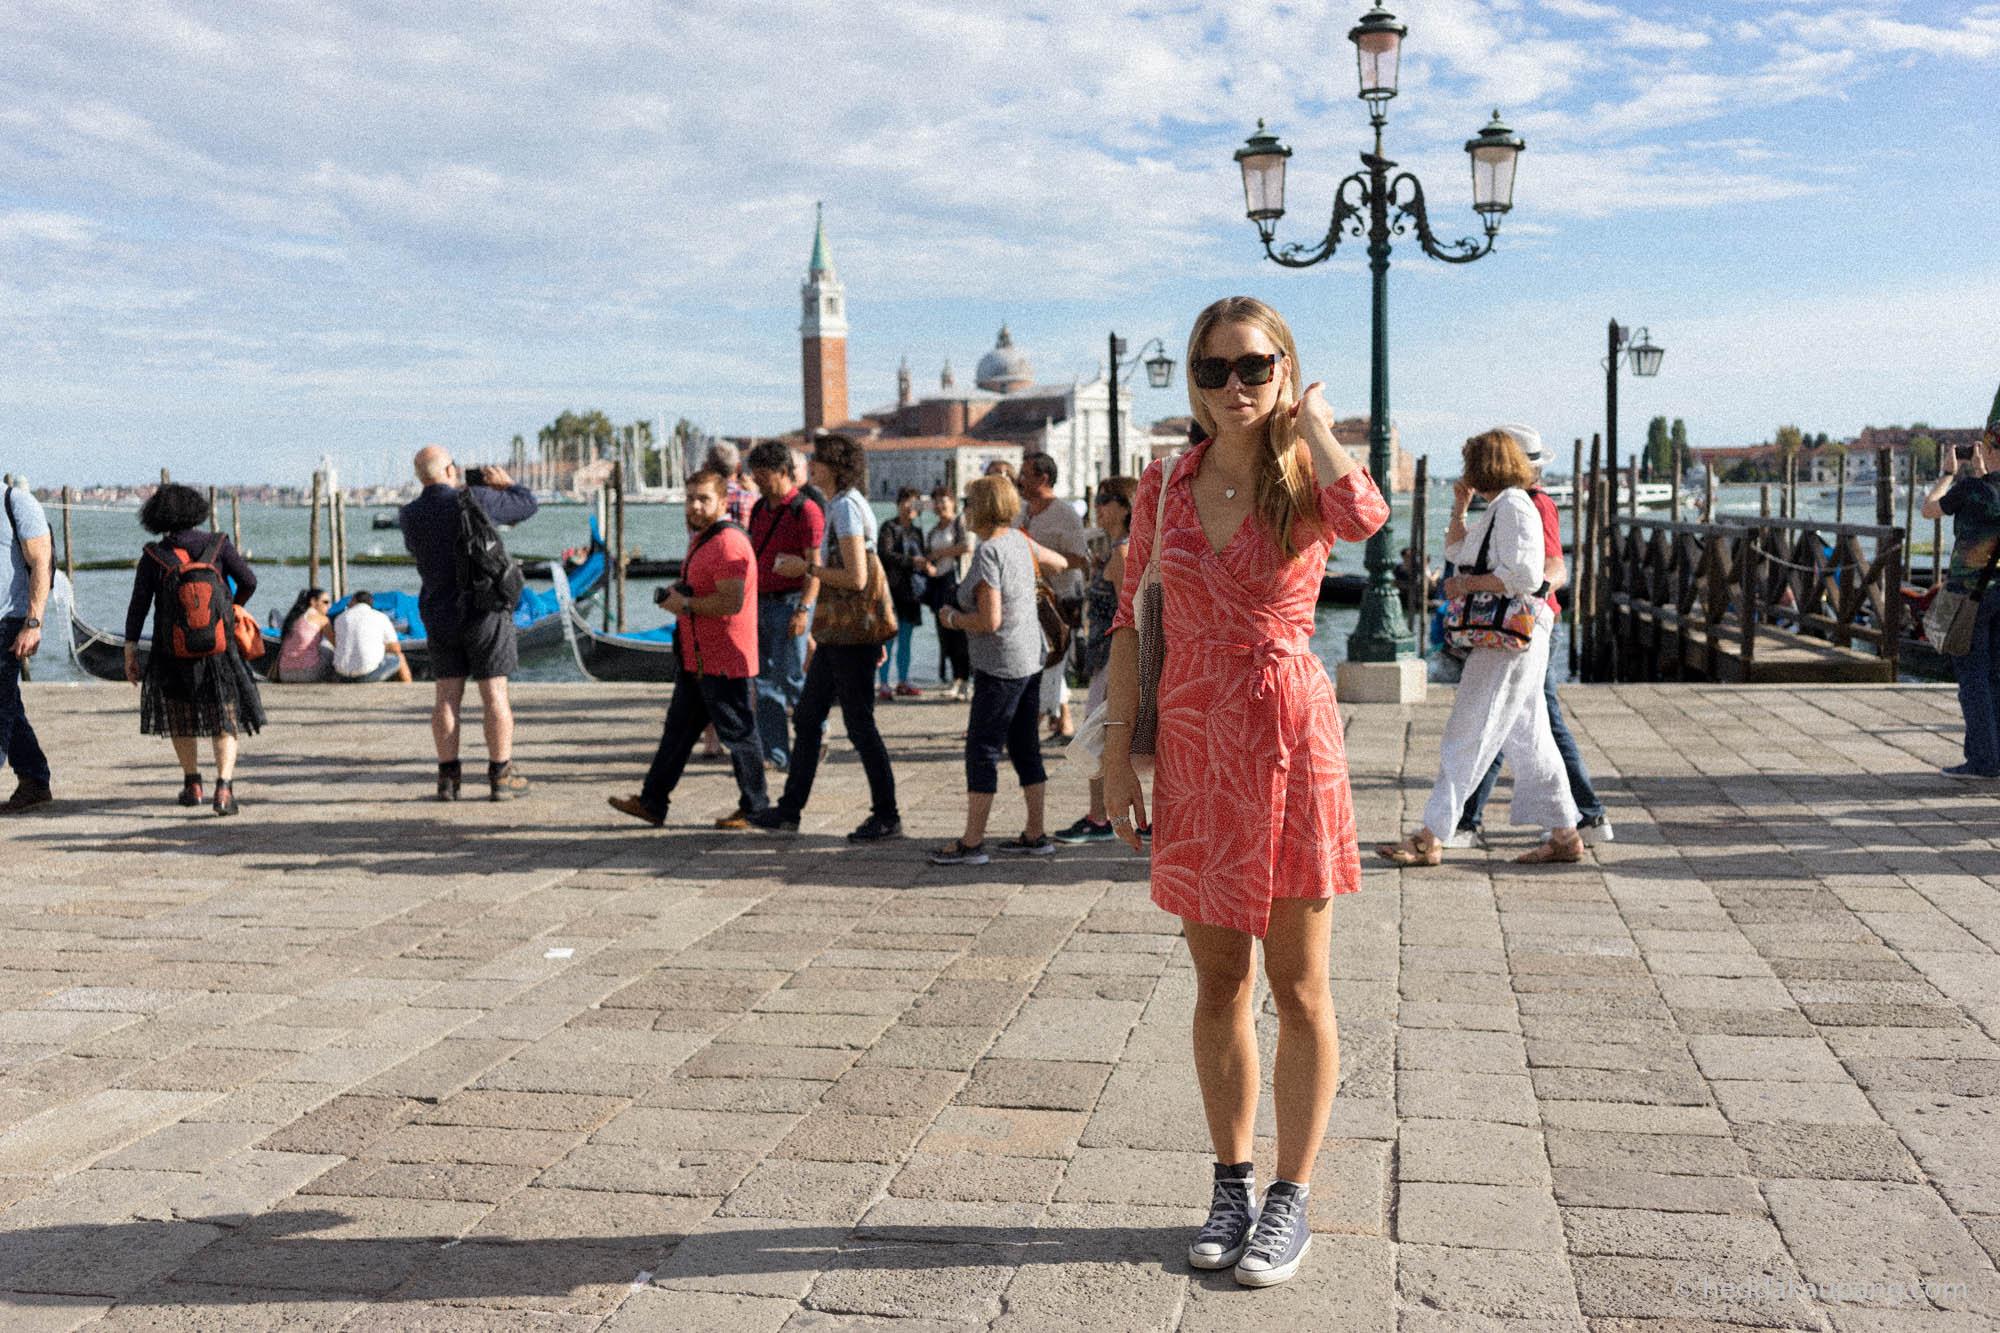 San Marco Campanile i Venezia